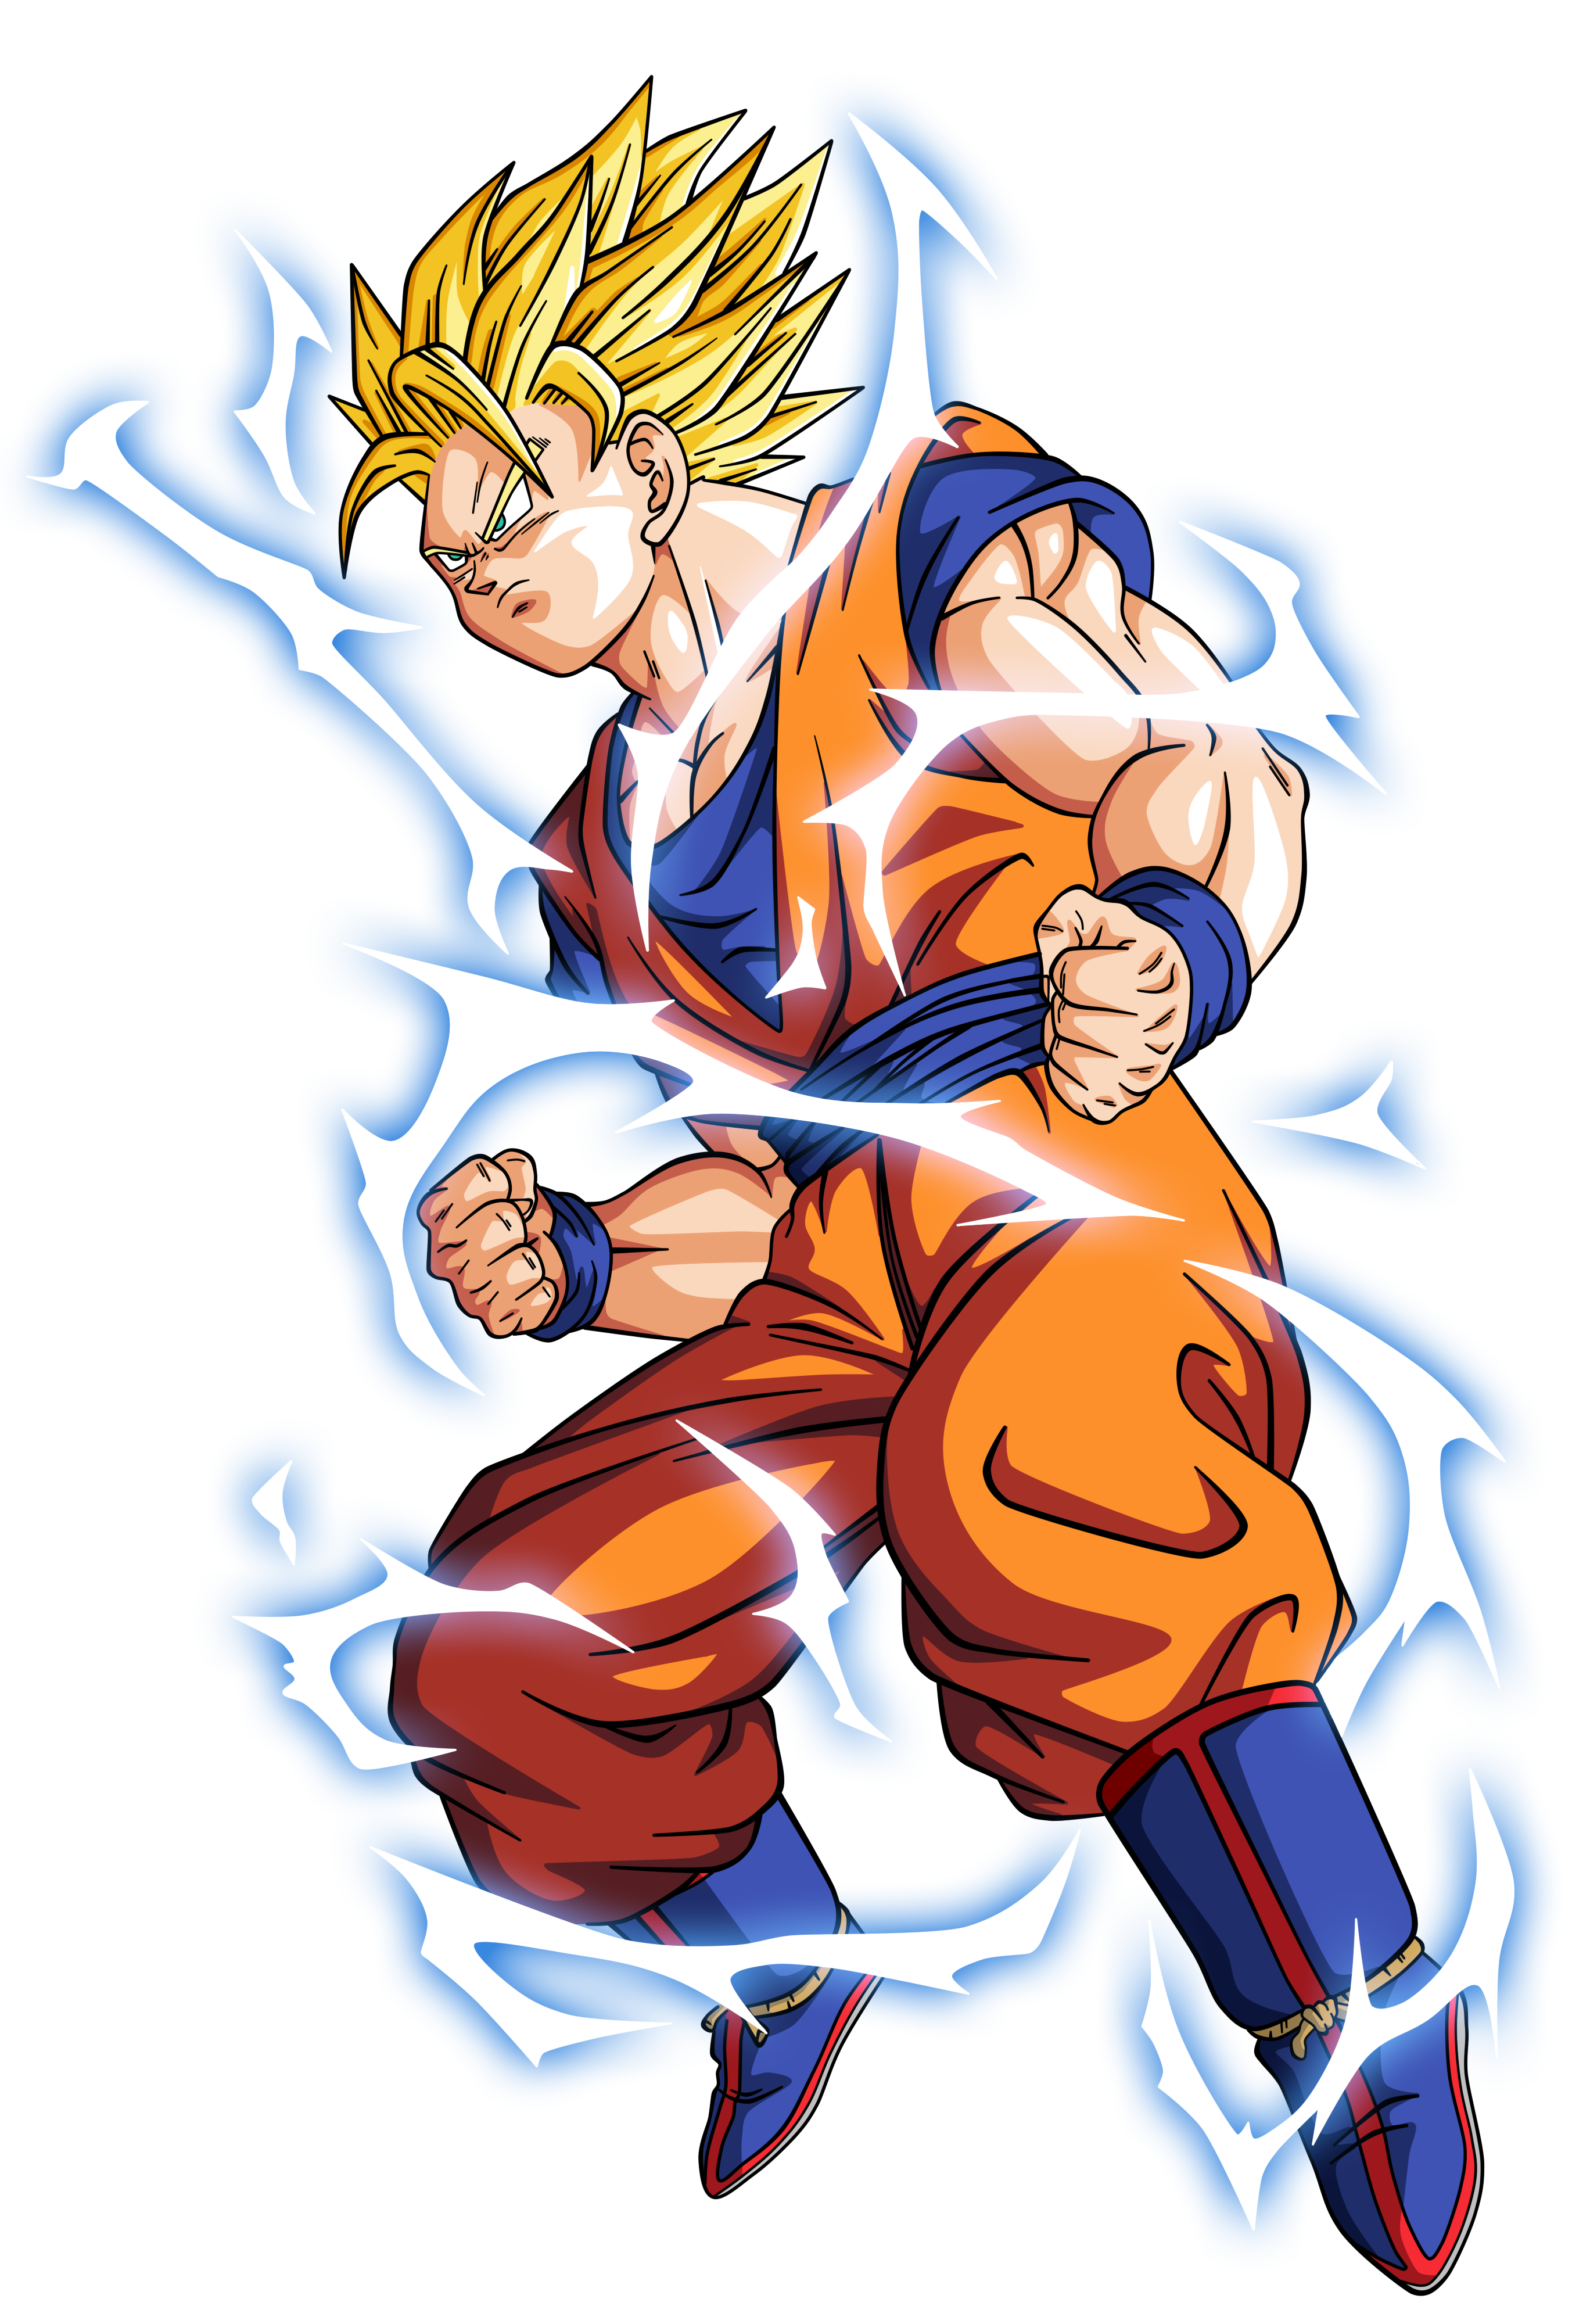 Goku super saiyan 2 by BardockSonic on DeviantArt Dragon Ball Z Goku Super Saiyan 2 Wallpapers